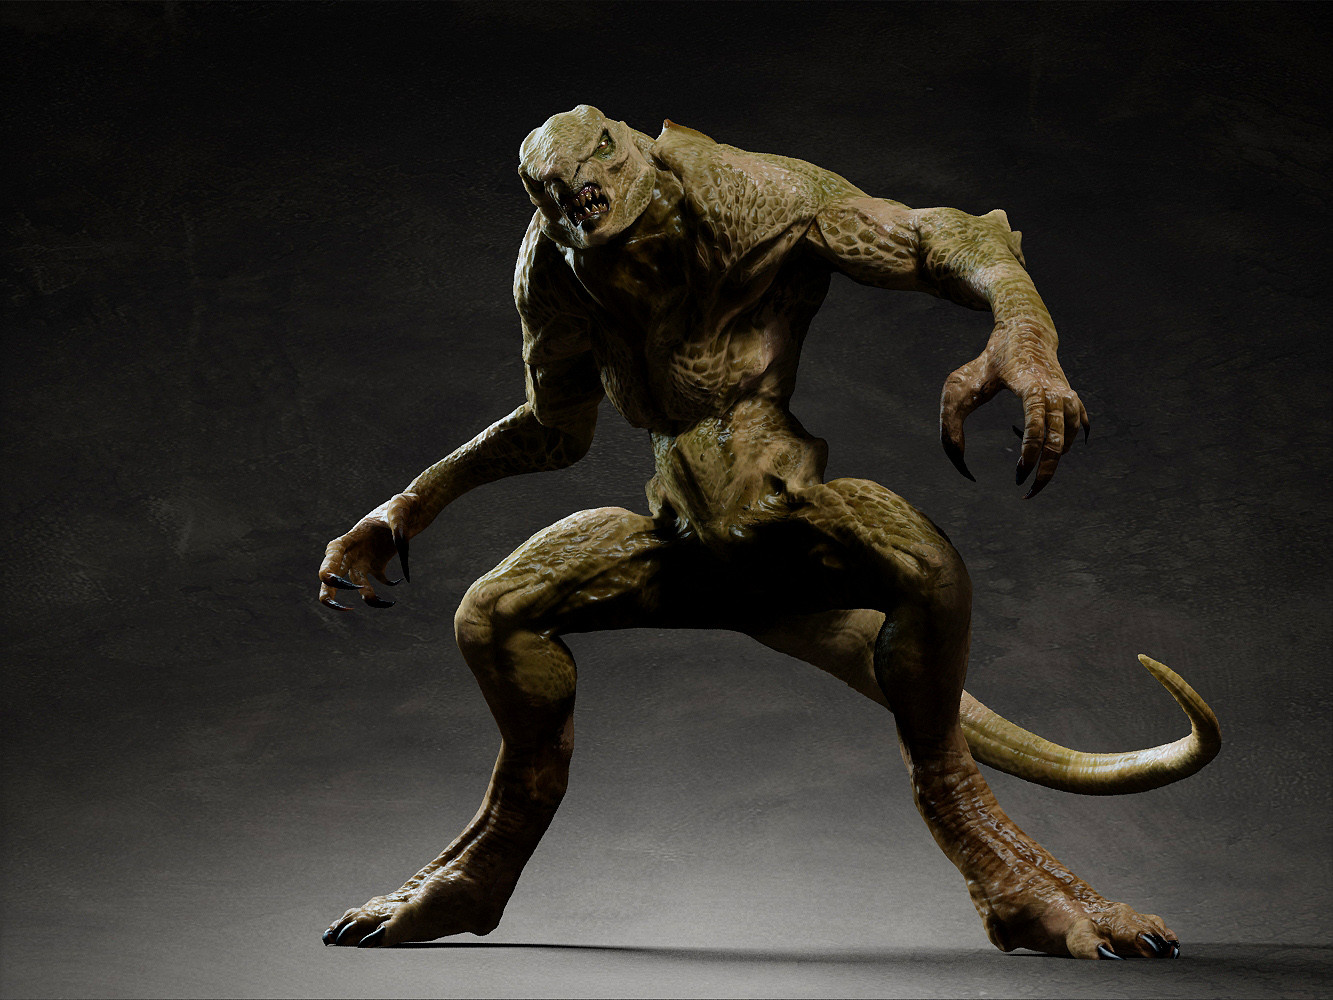 Free 3d creature movies xxx comics